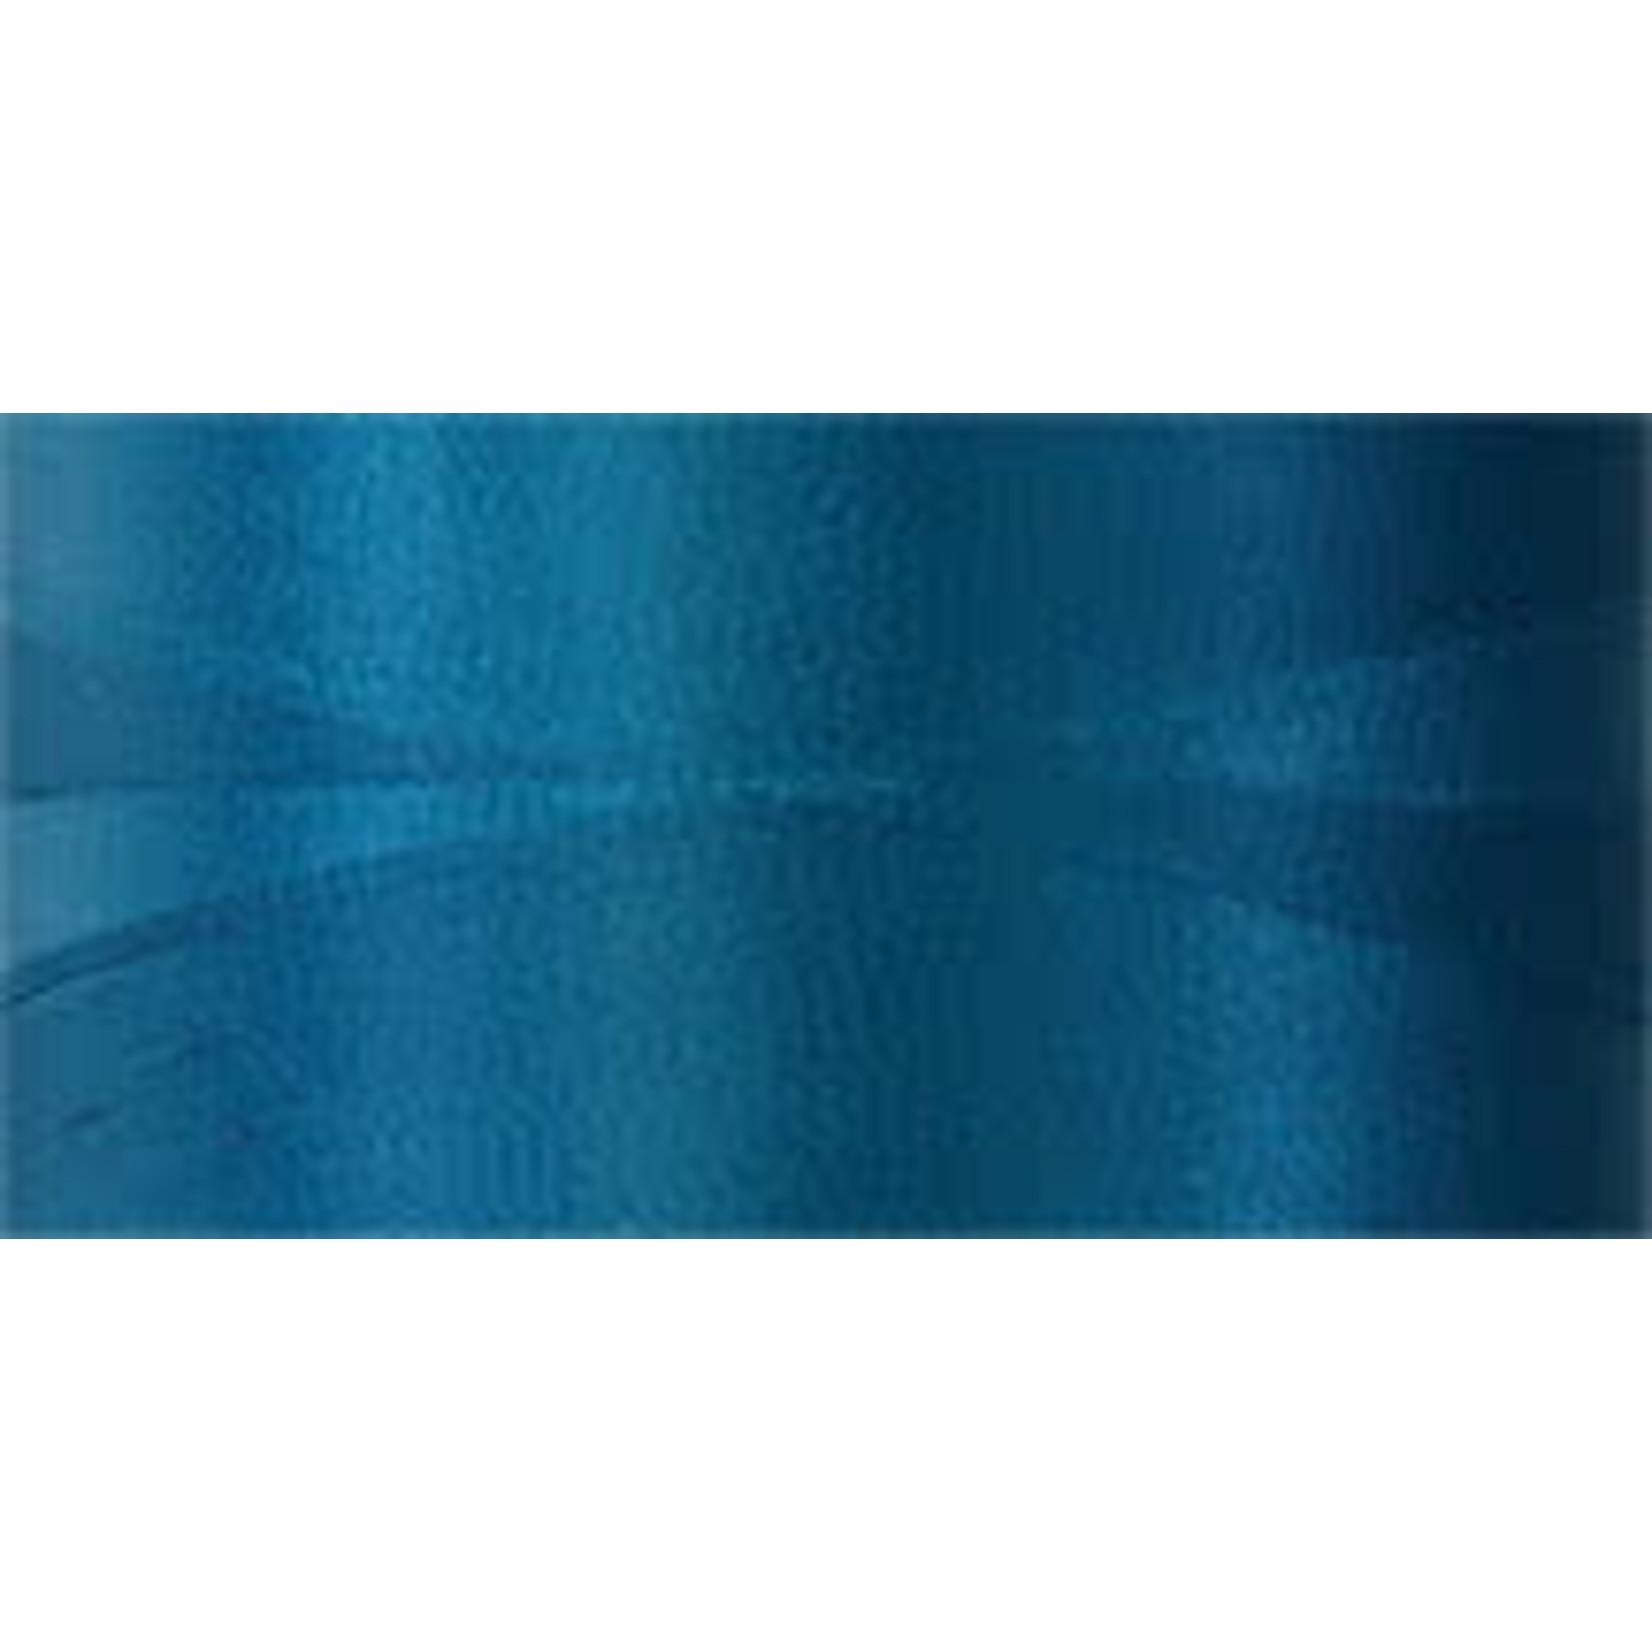 Superior Threads Bottom Line - #60 - 1300 m - 611 Turquoise